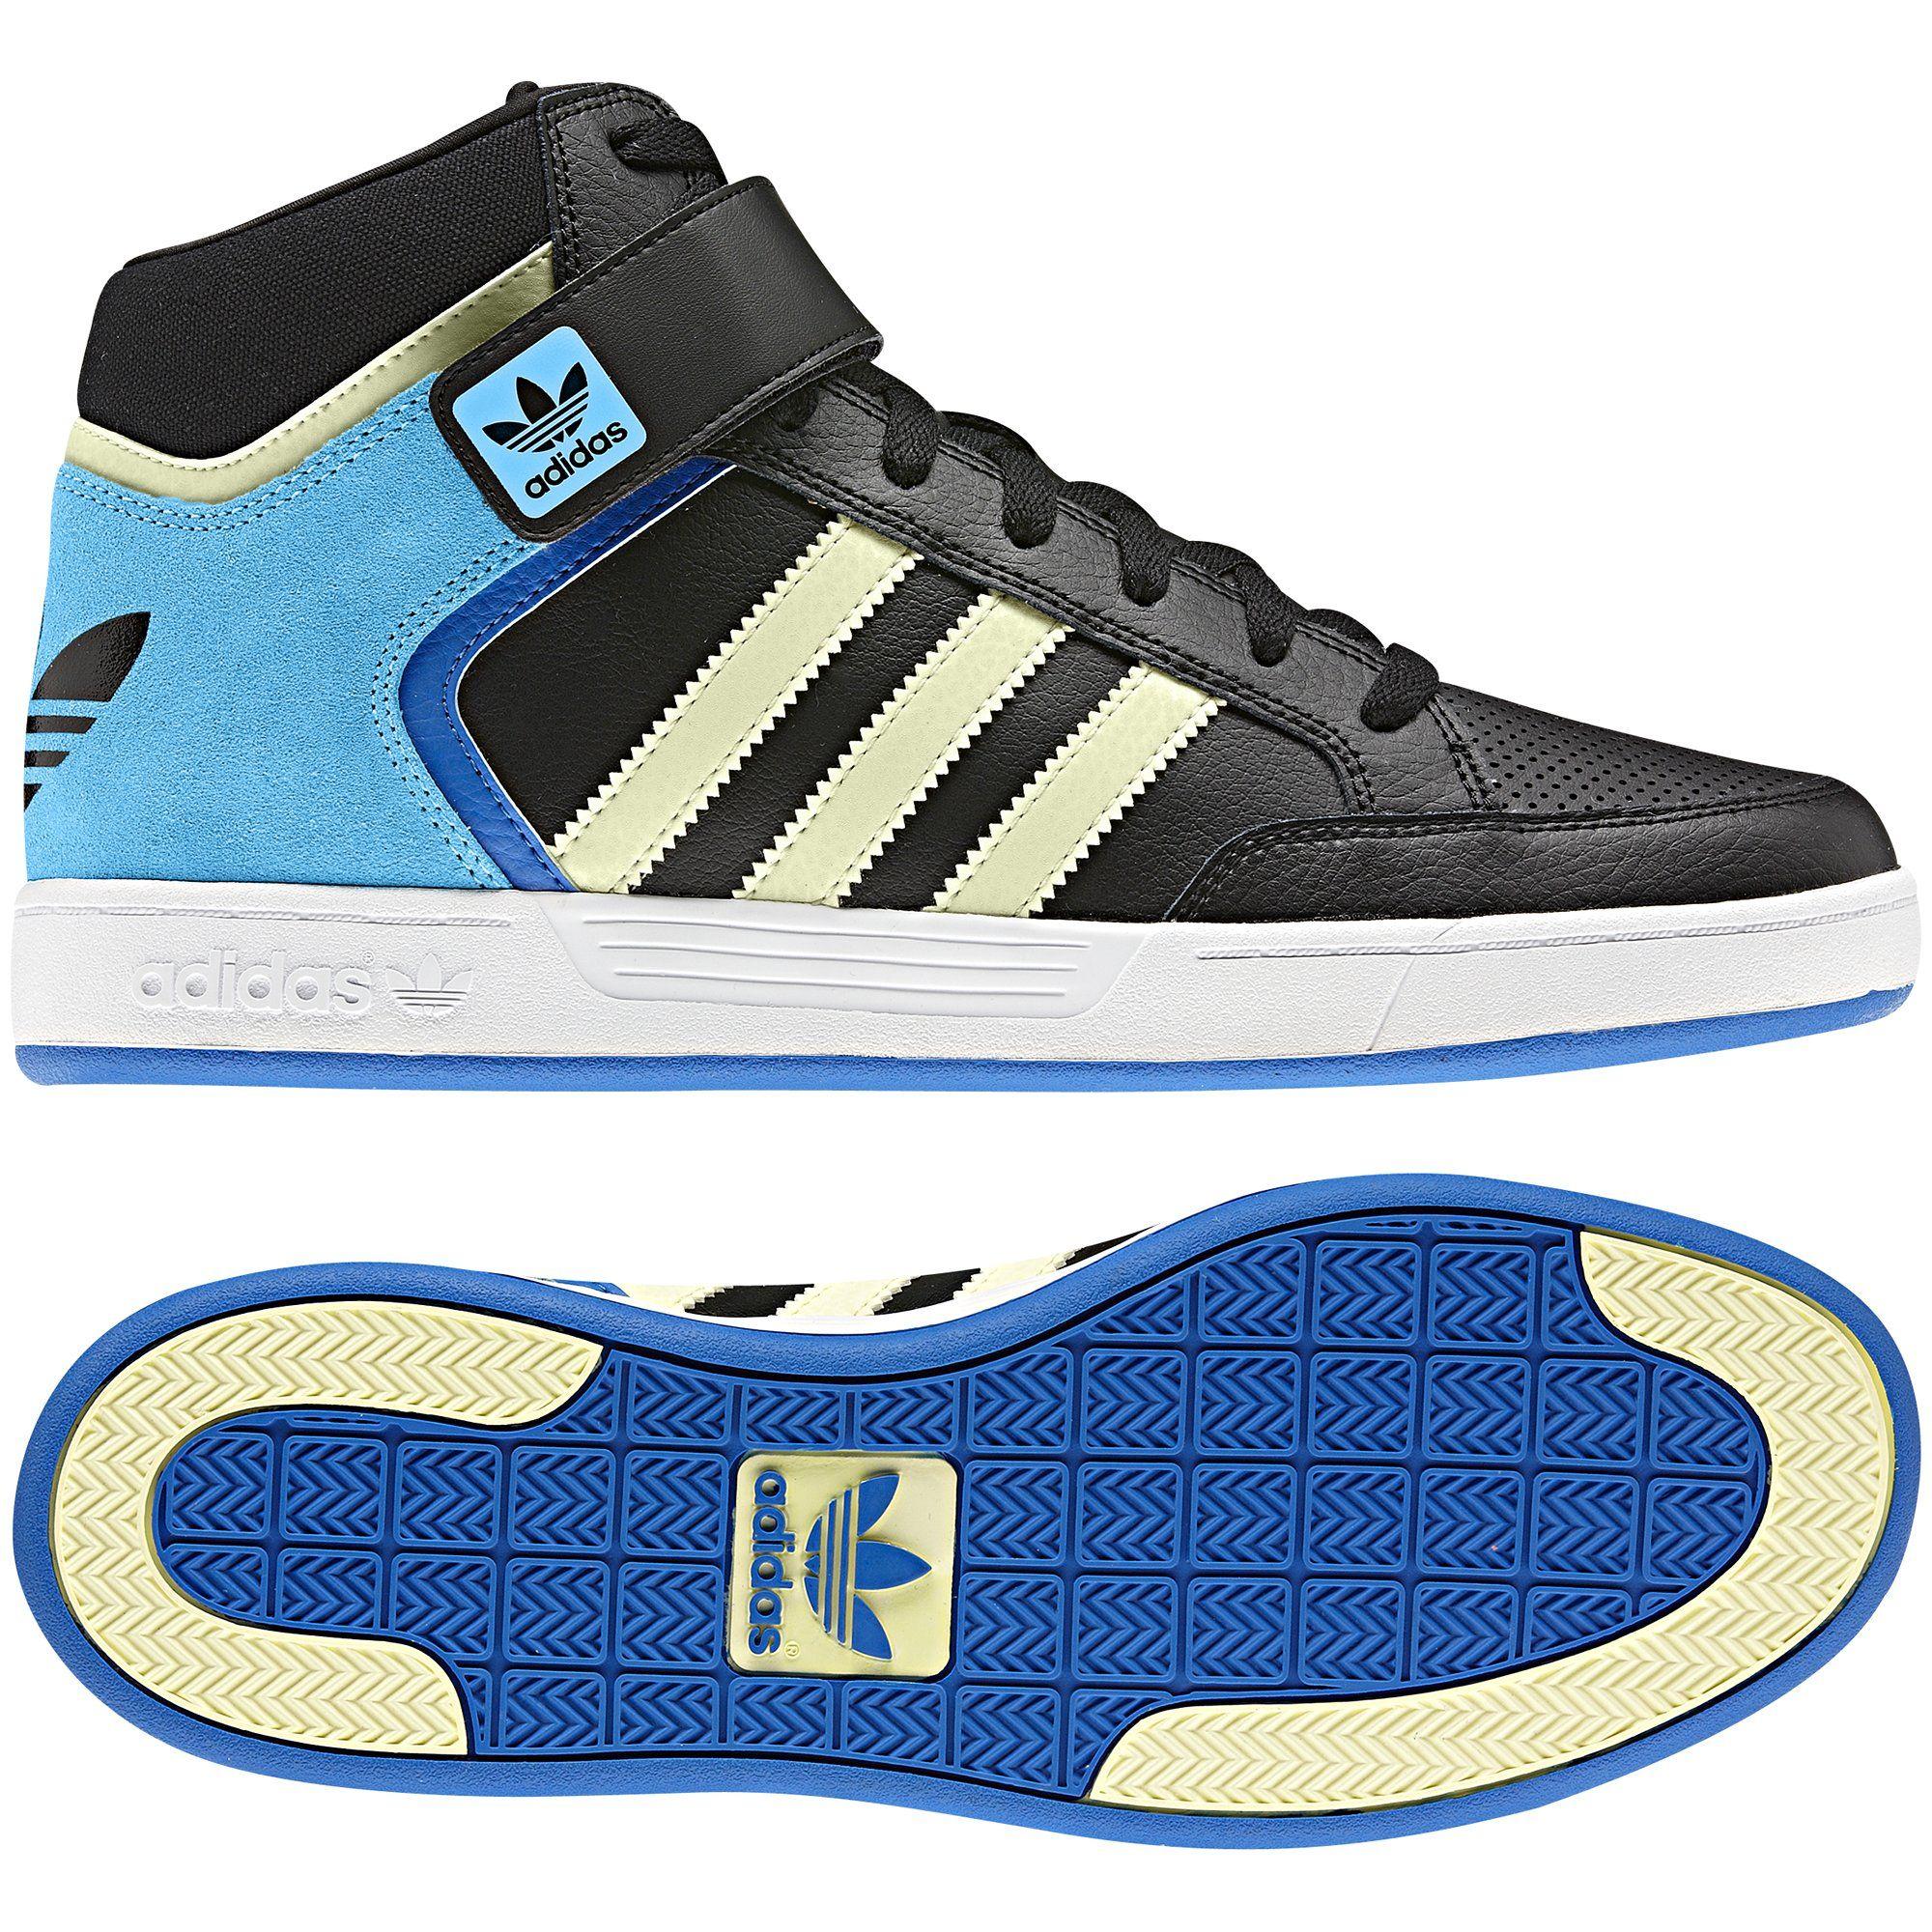 Adidas Varial Mid Shoe | Sport shoes women, Sport fashion, Shoes